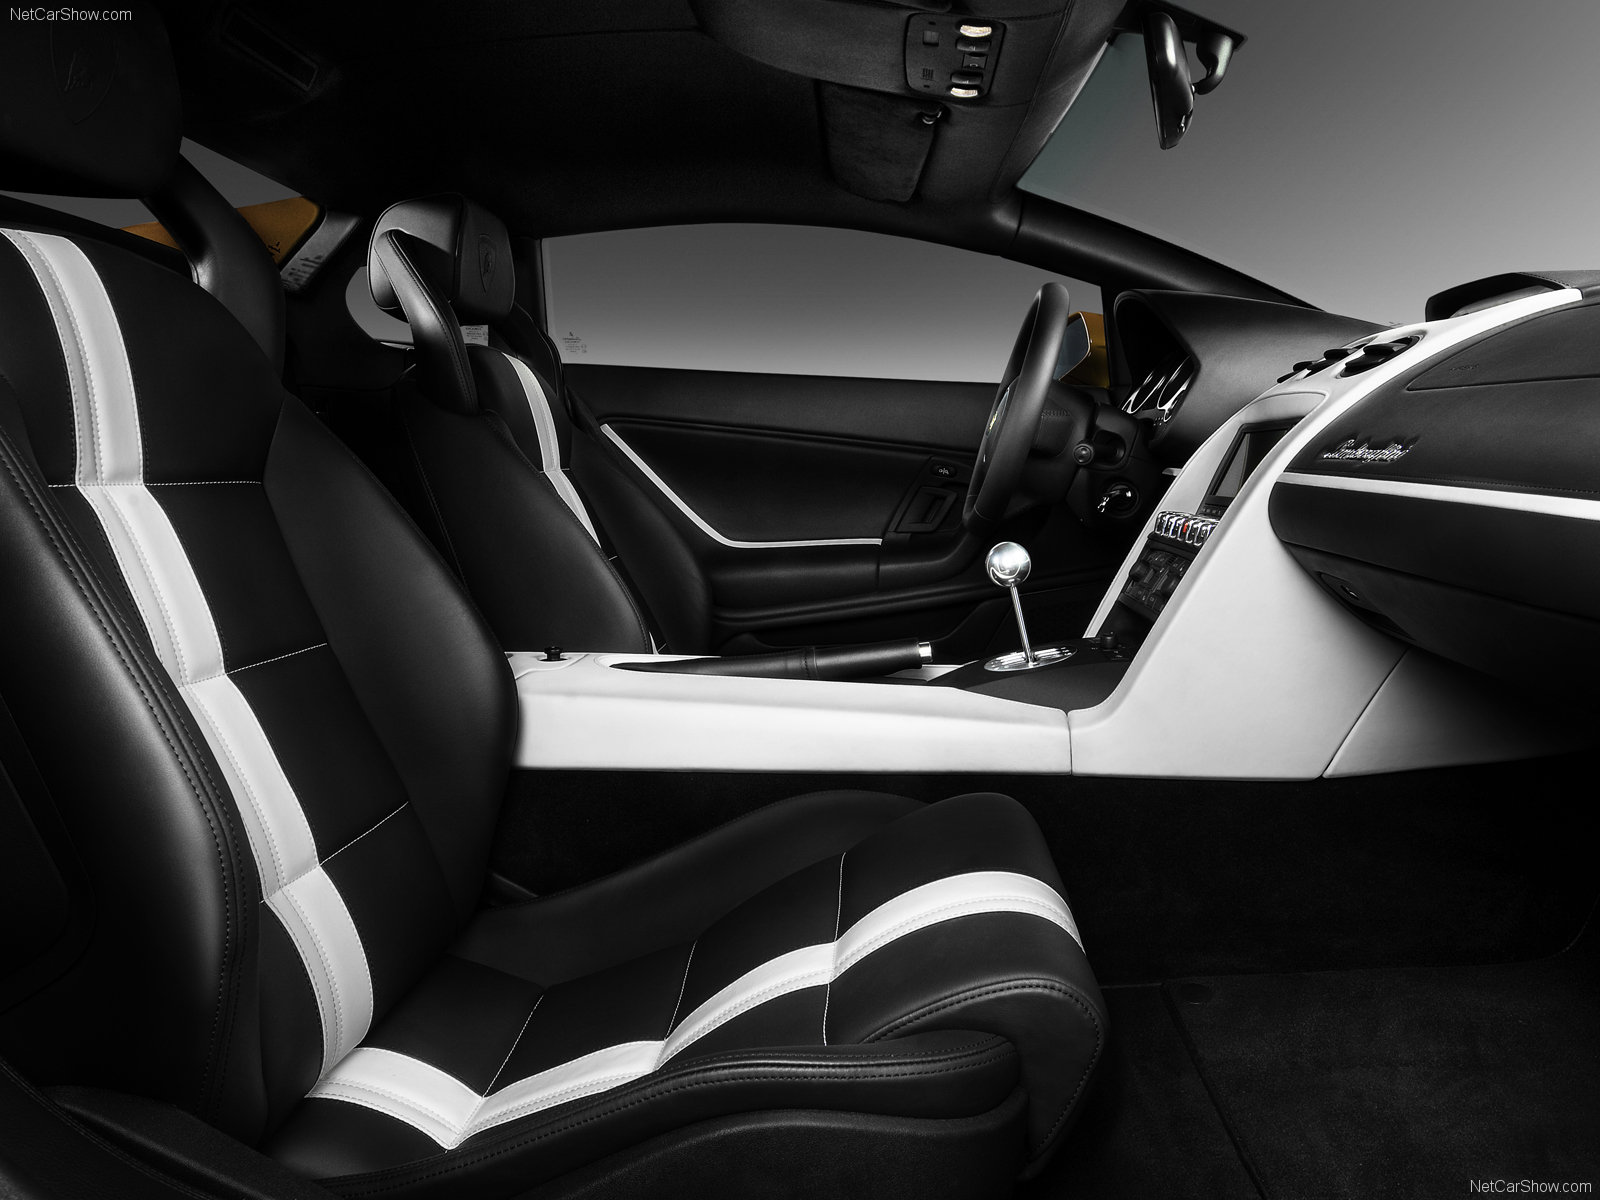 Hình ảnh siêu xe Lamborghini Gallardo LP550-2 2010 & nội ngoại thất